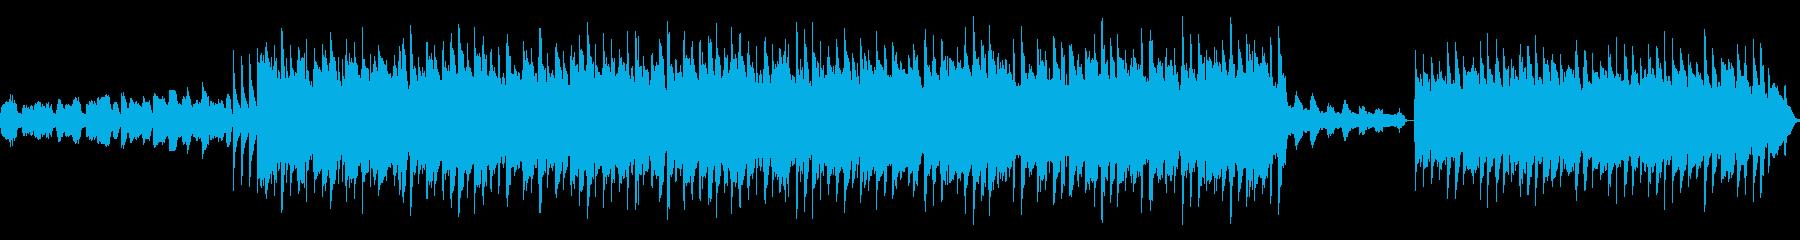 【Dr抜】ノリ良いエレクトロスウィングの再生済みの波形